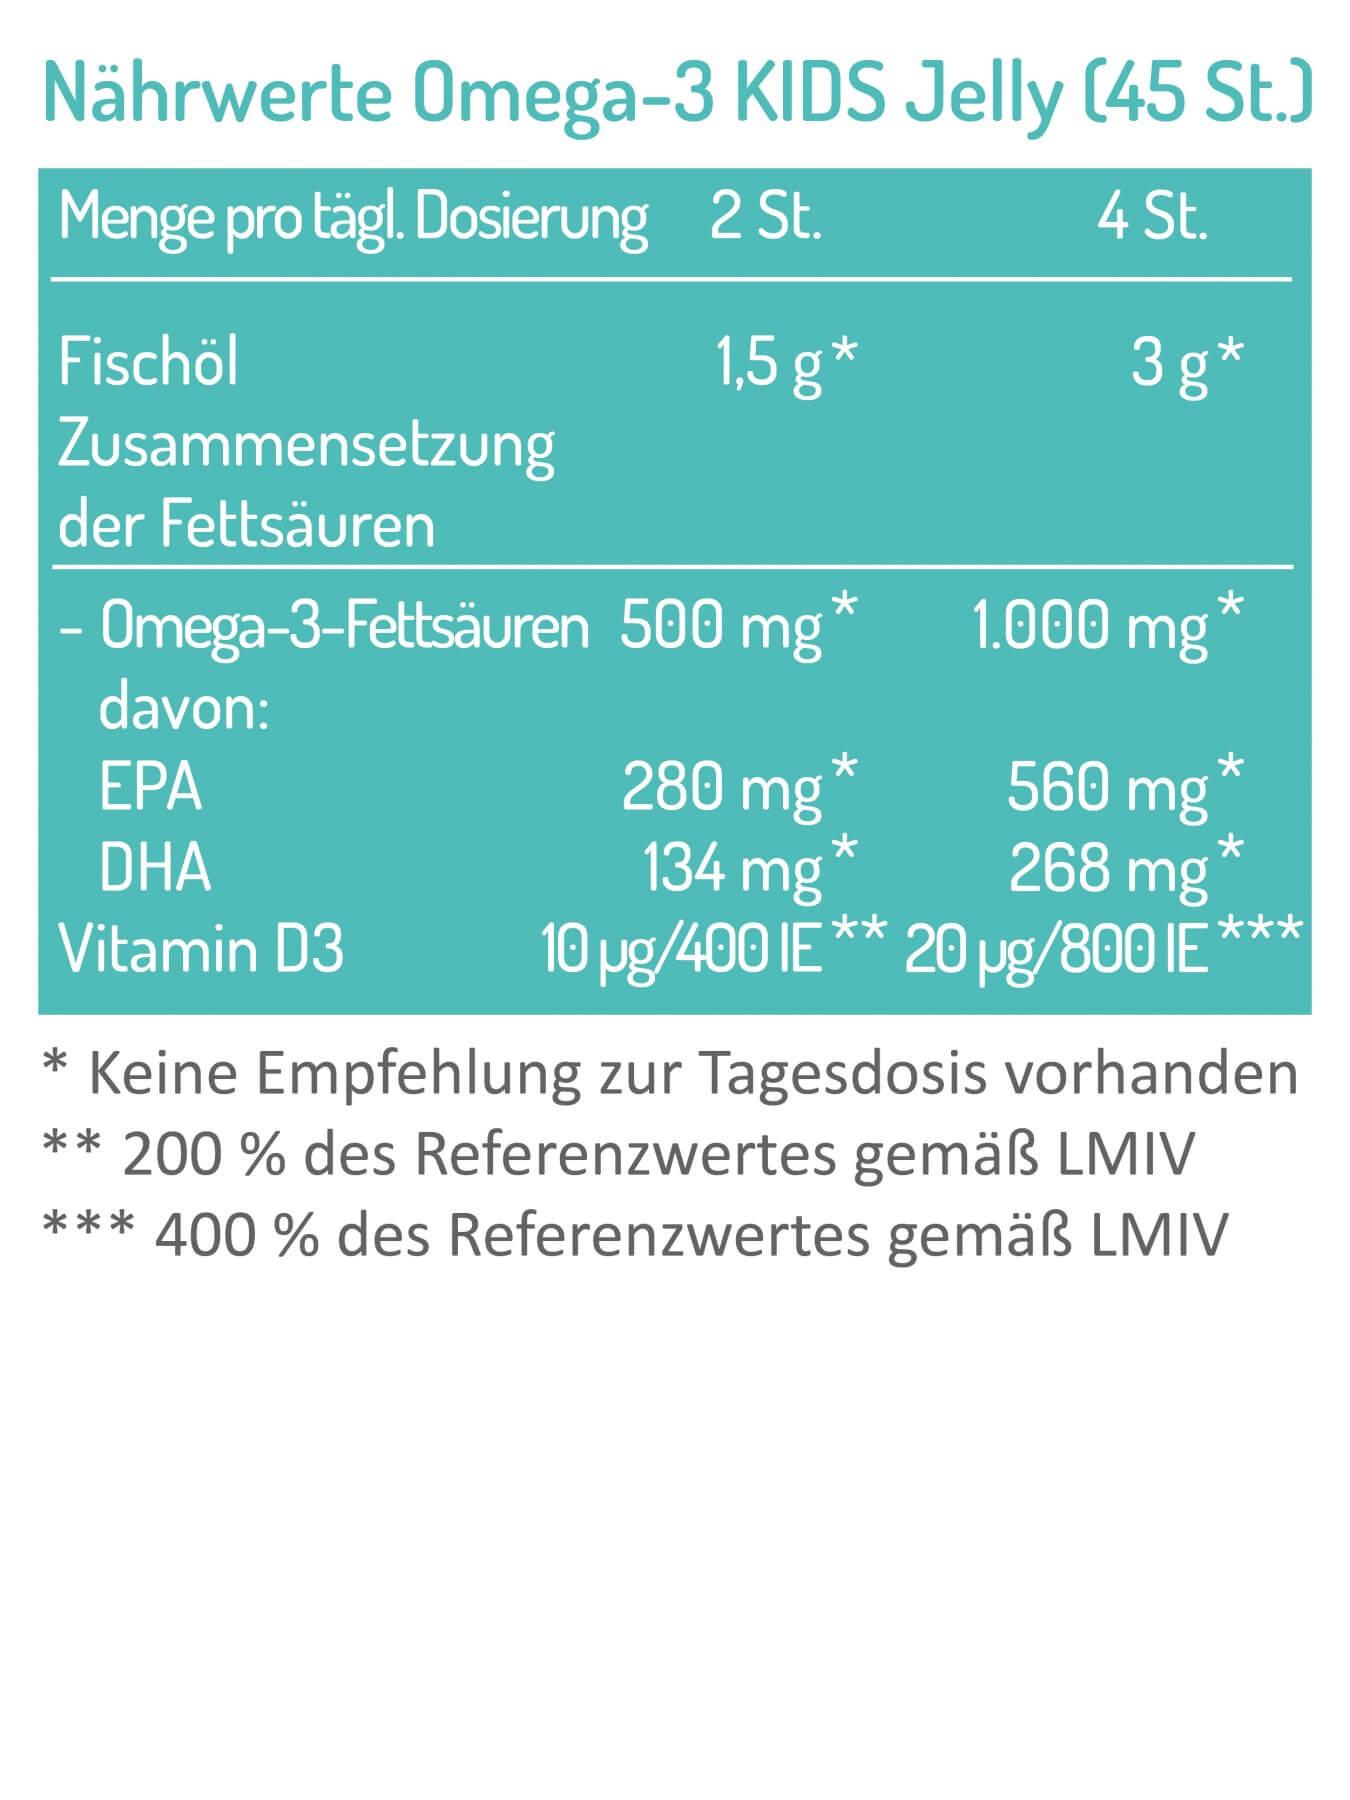 Omega-3 KIDS Jelly 6